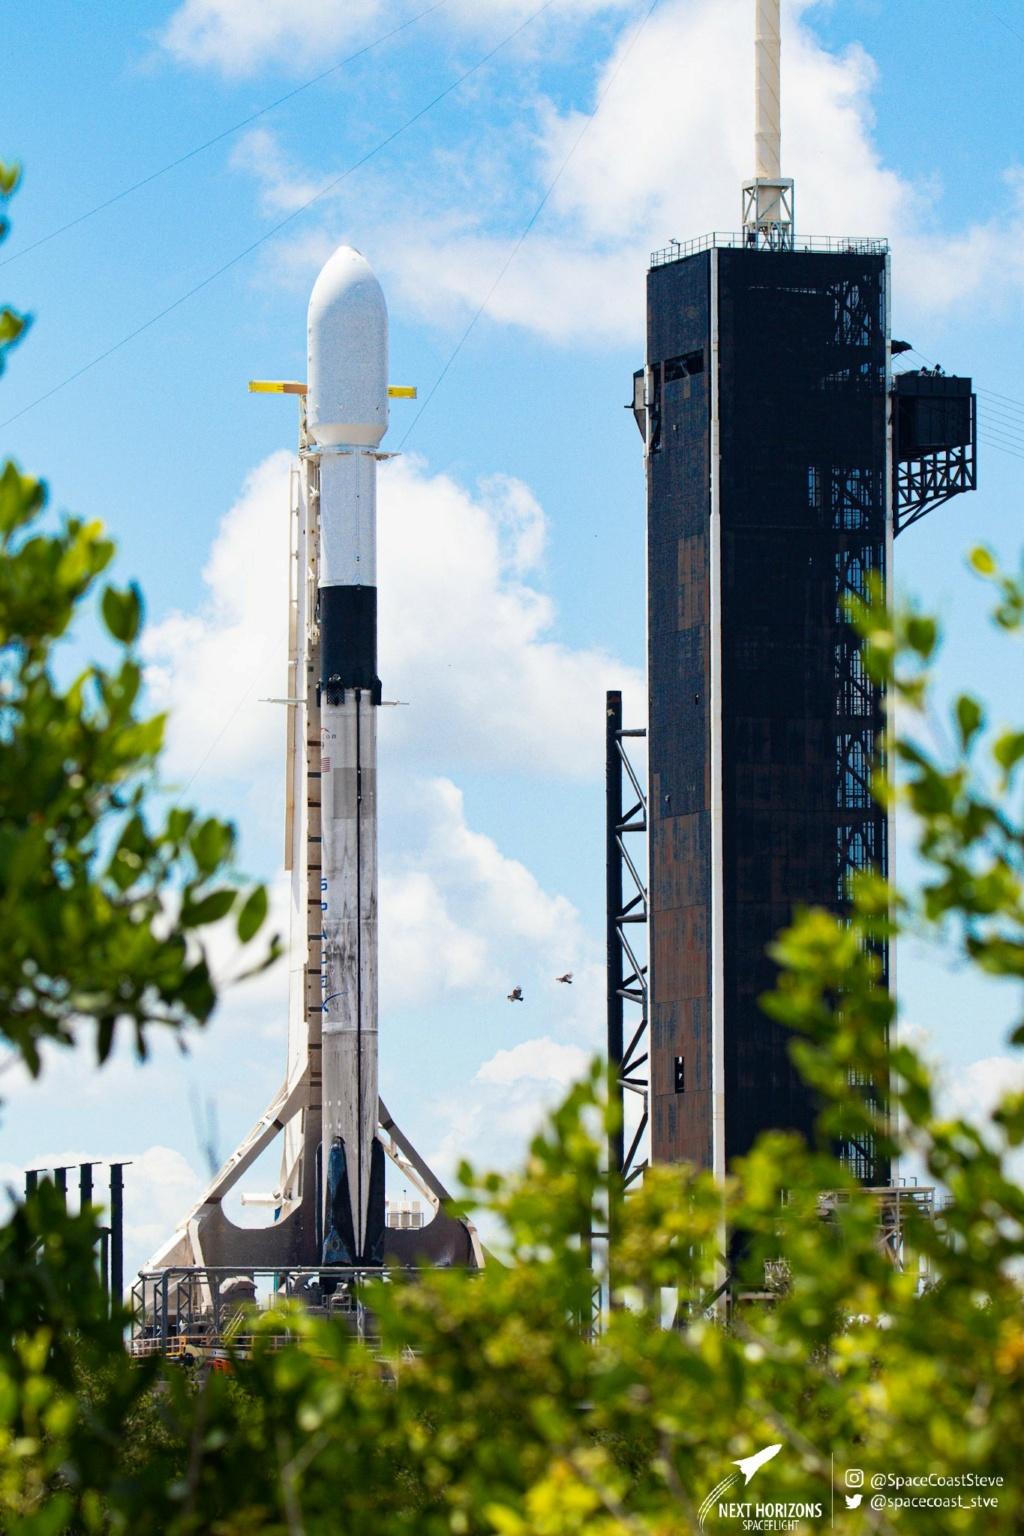 Falcon 9 (Starlink V1. 0 L11)- KSC - 3.9.2020 [Succès] 2_jfif59